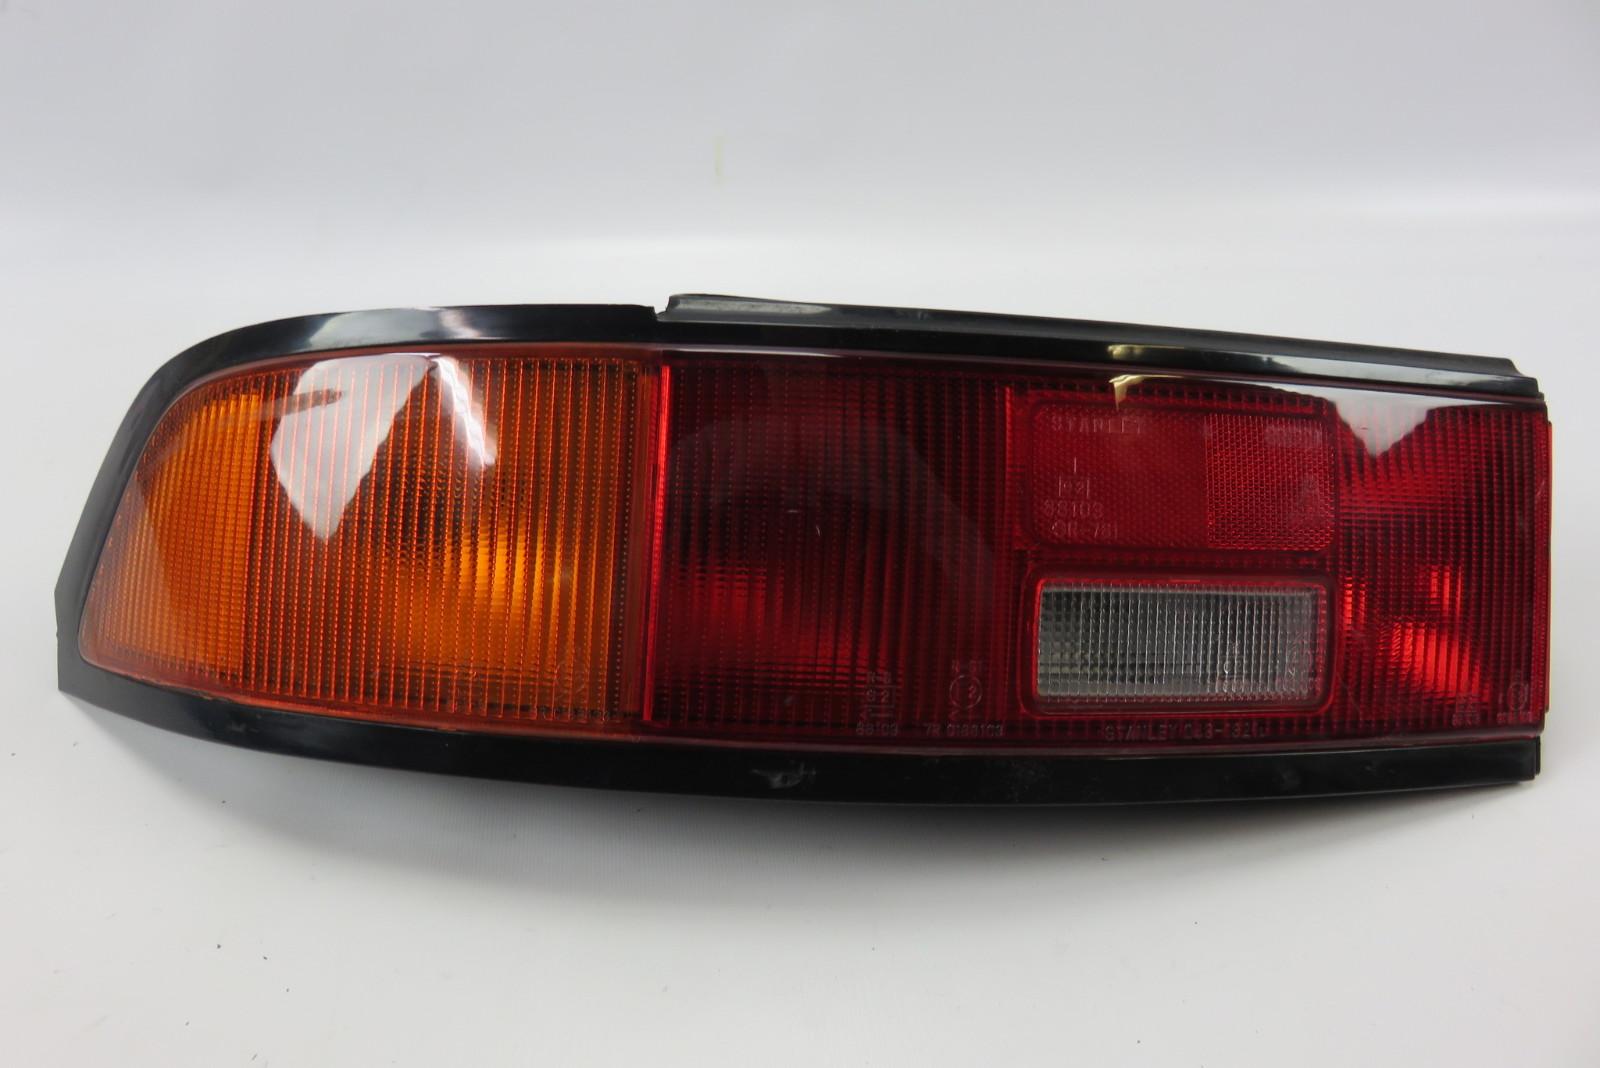 03 Aston Martin Db7 Left Tail Light Lamp Assembly Oem S